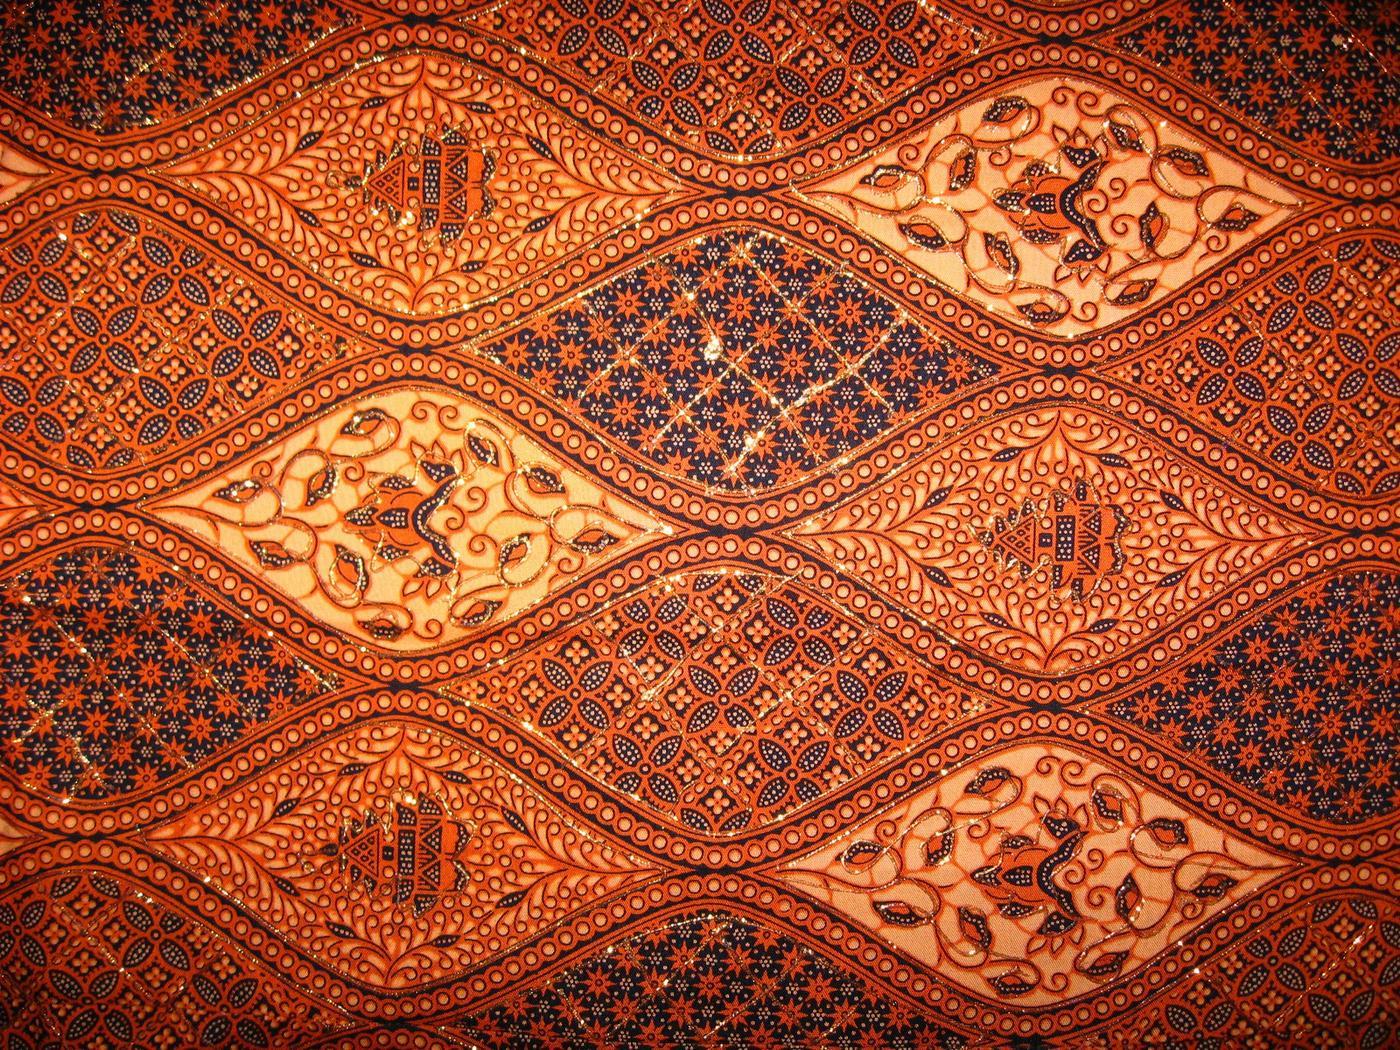 Batik Nusantara  Sejarah Batik Nusantara  Sejarah Batik  Batik  Batik